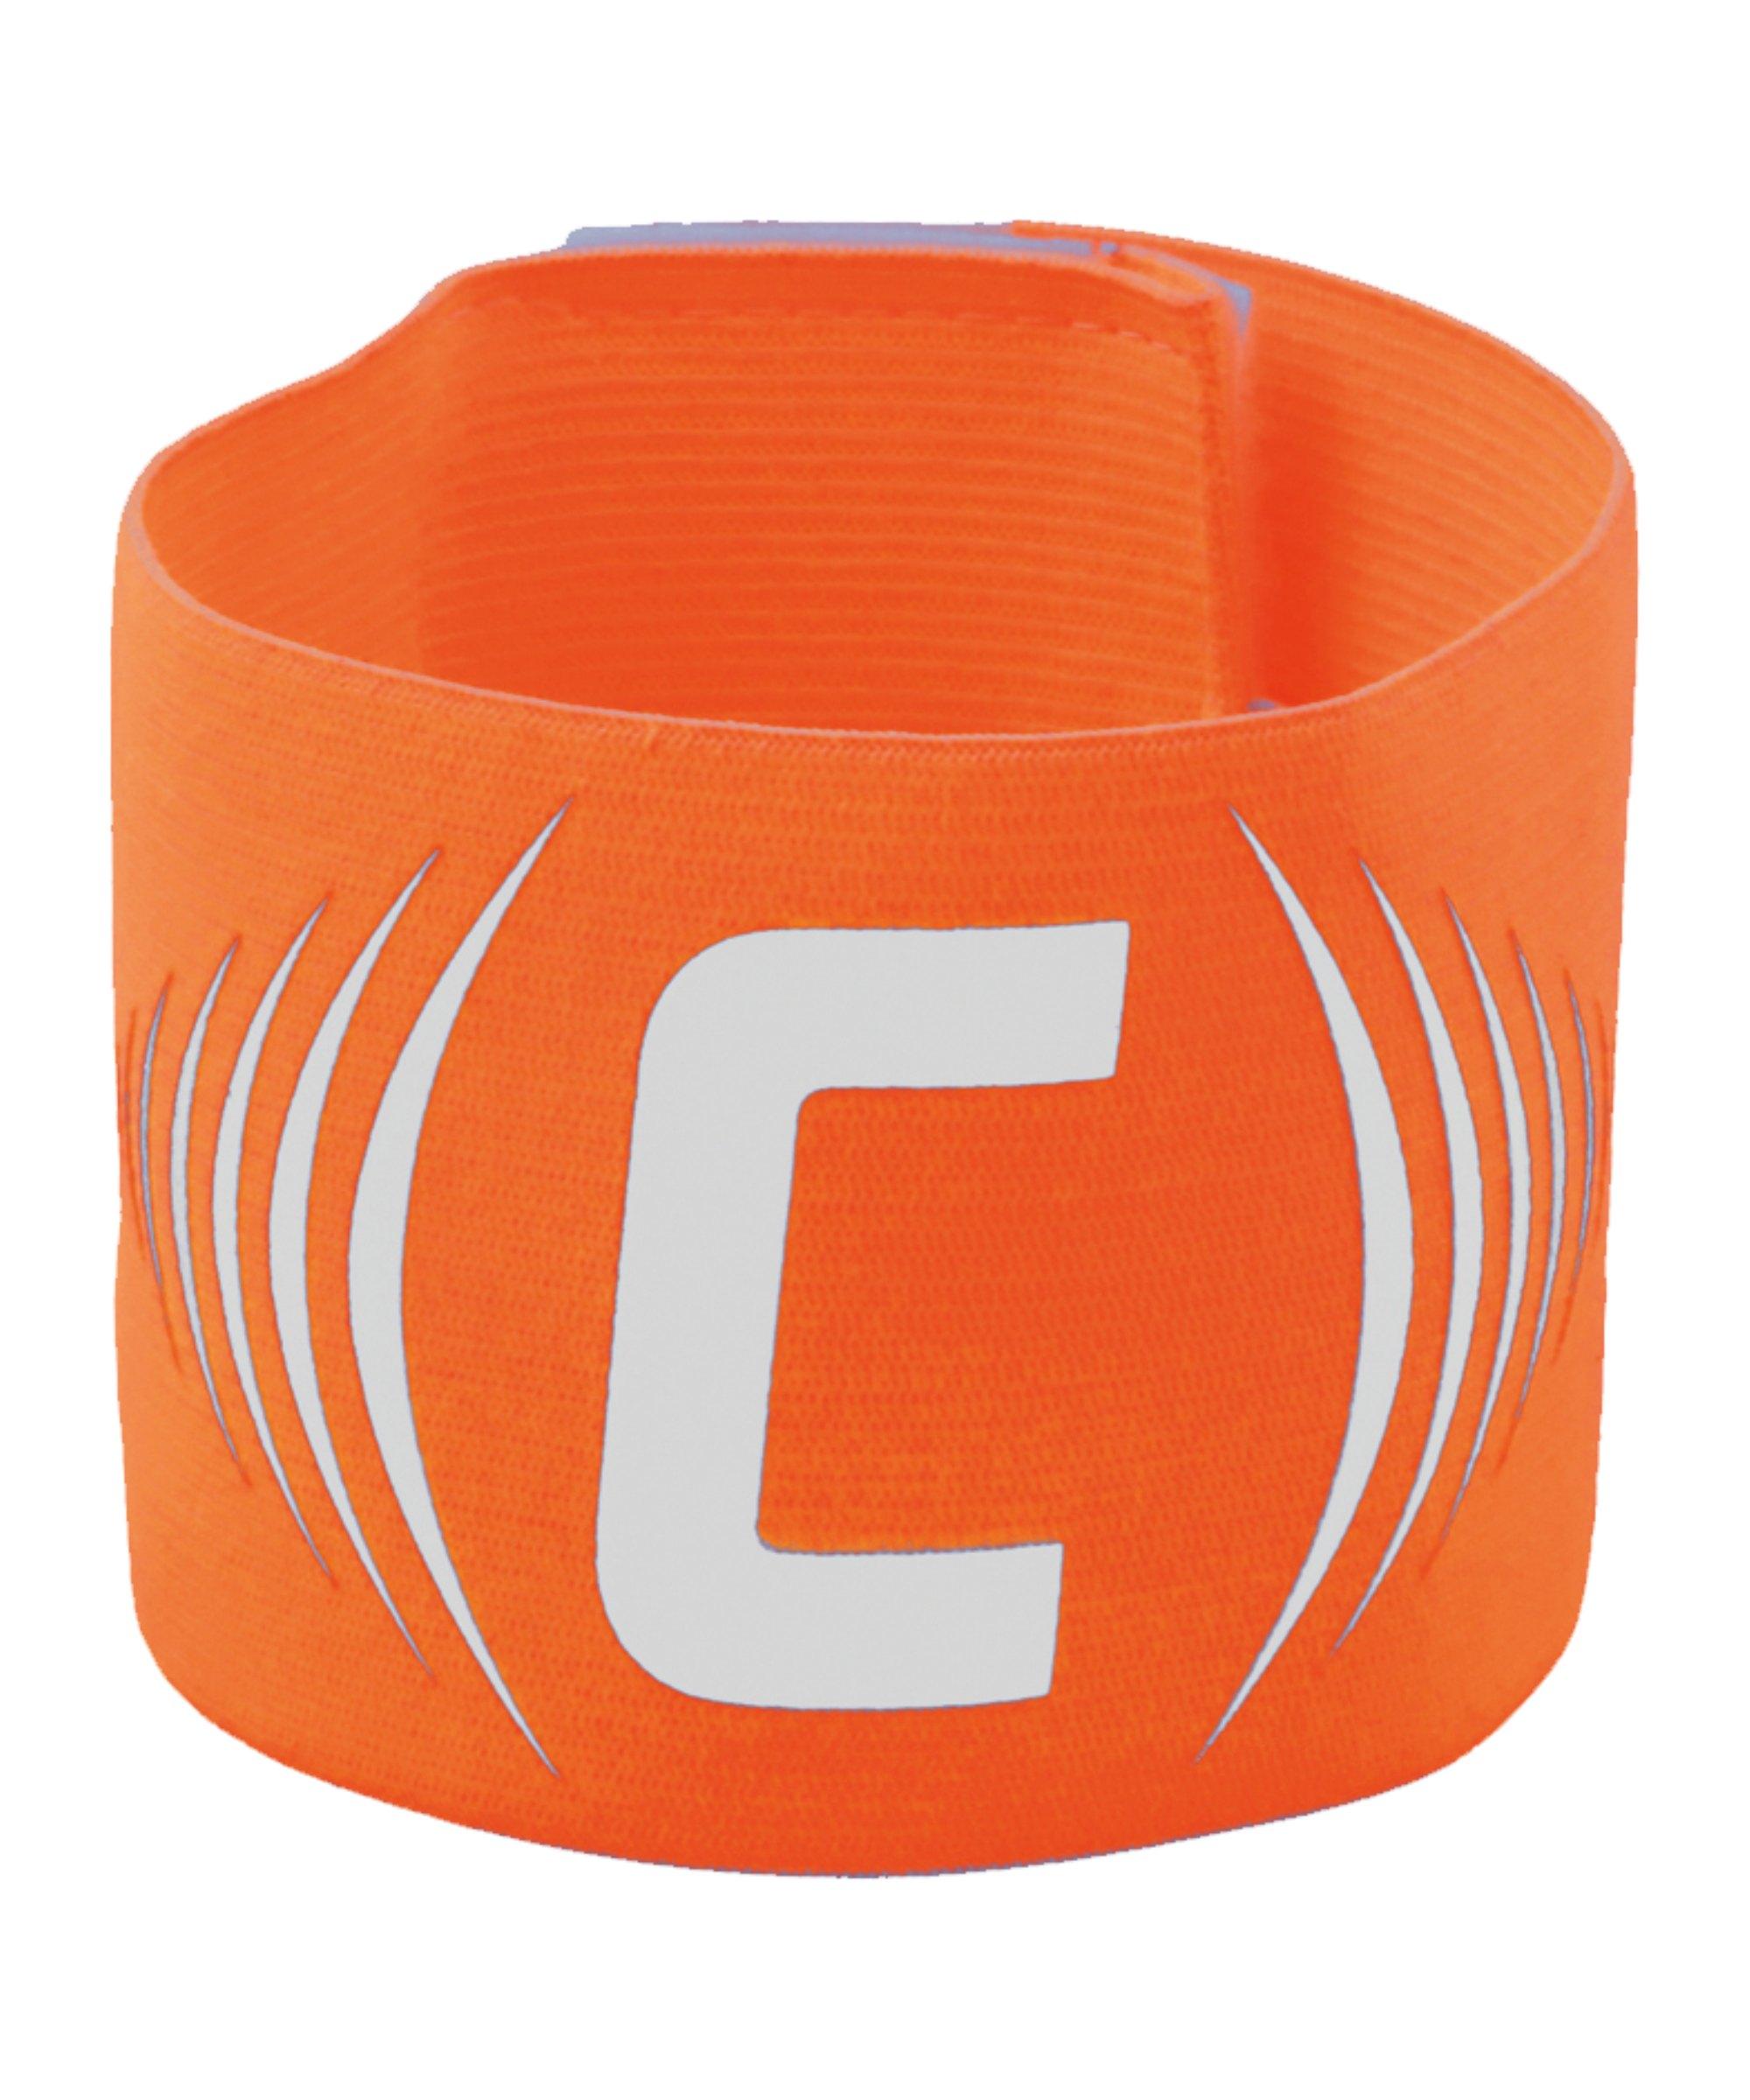 Cawila Armbinde C Klett Orange - orange